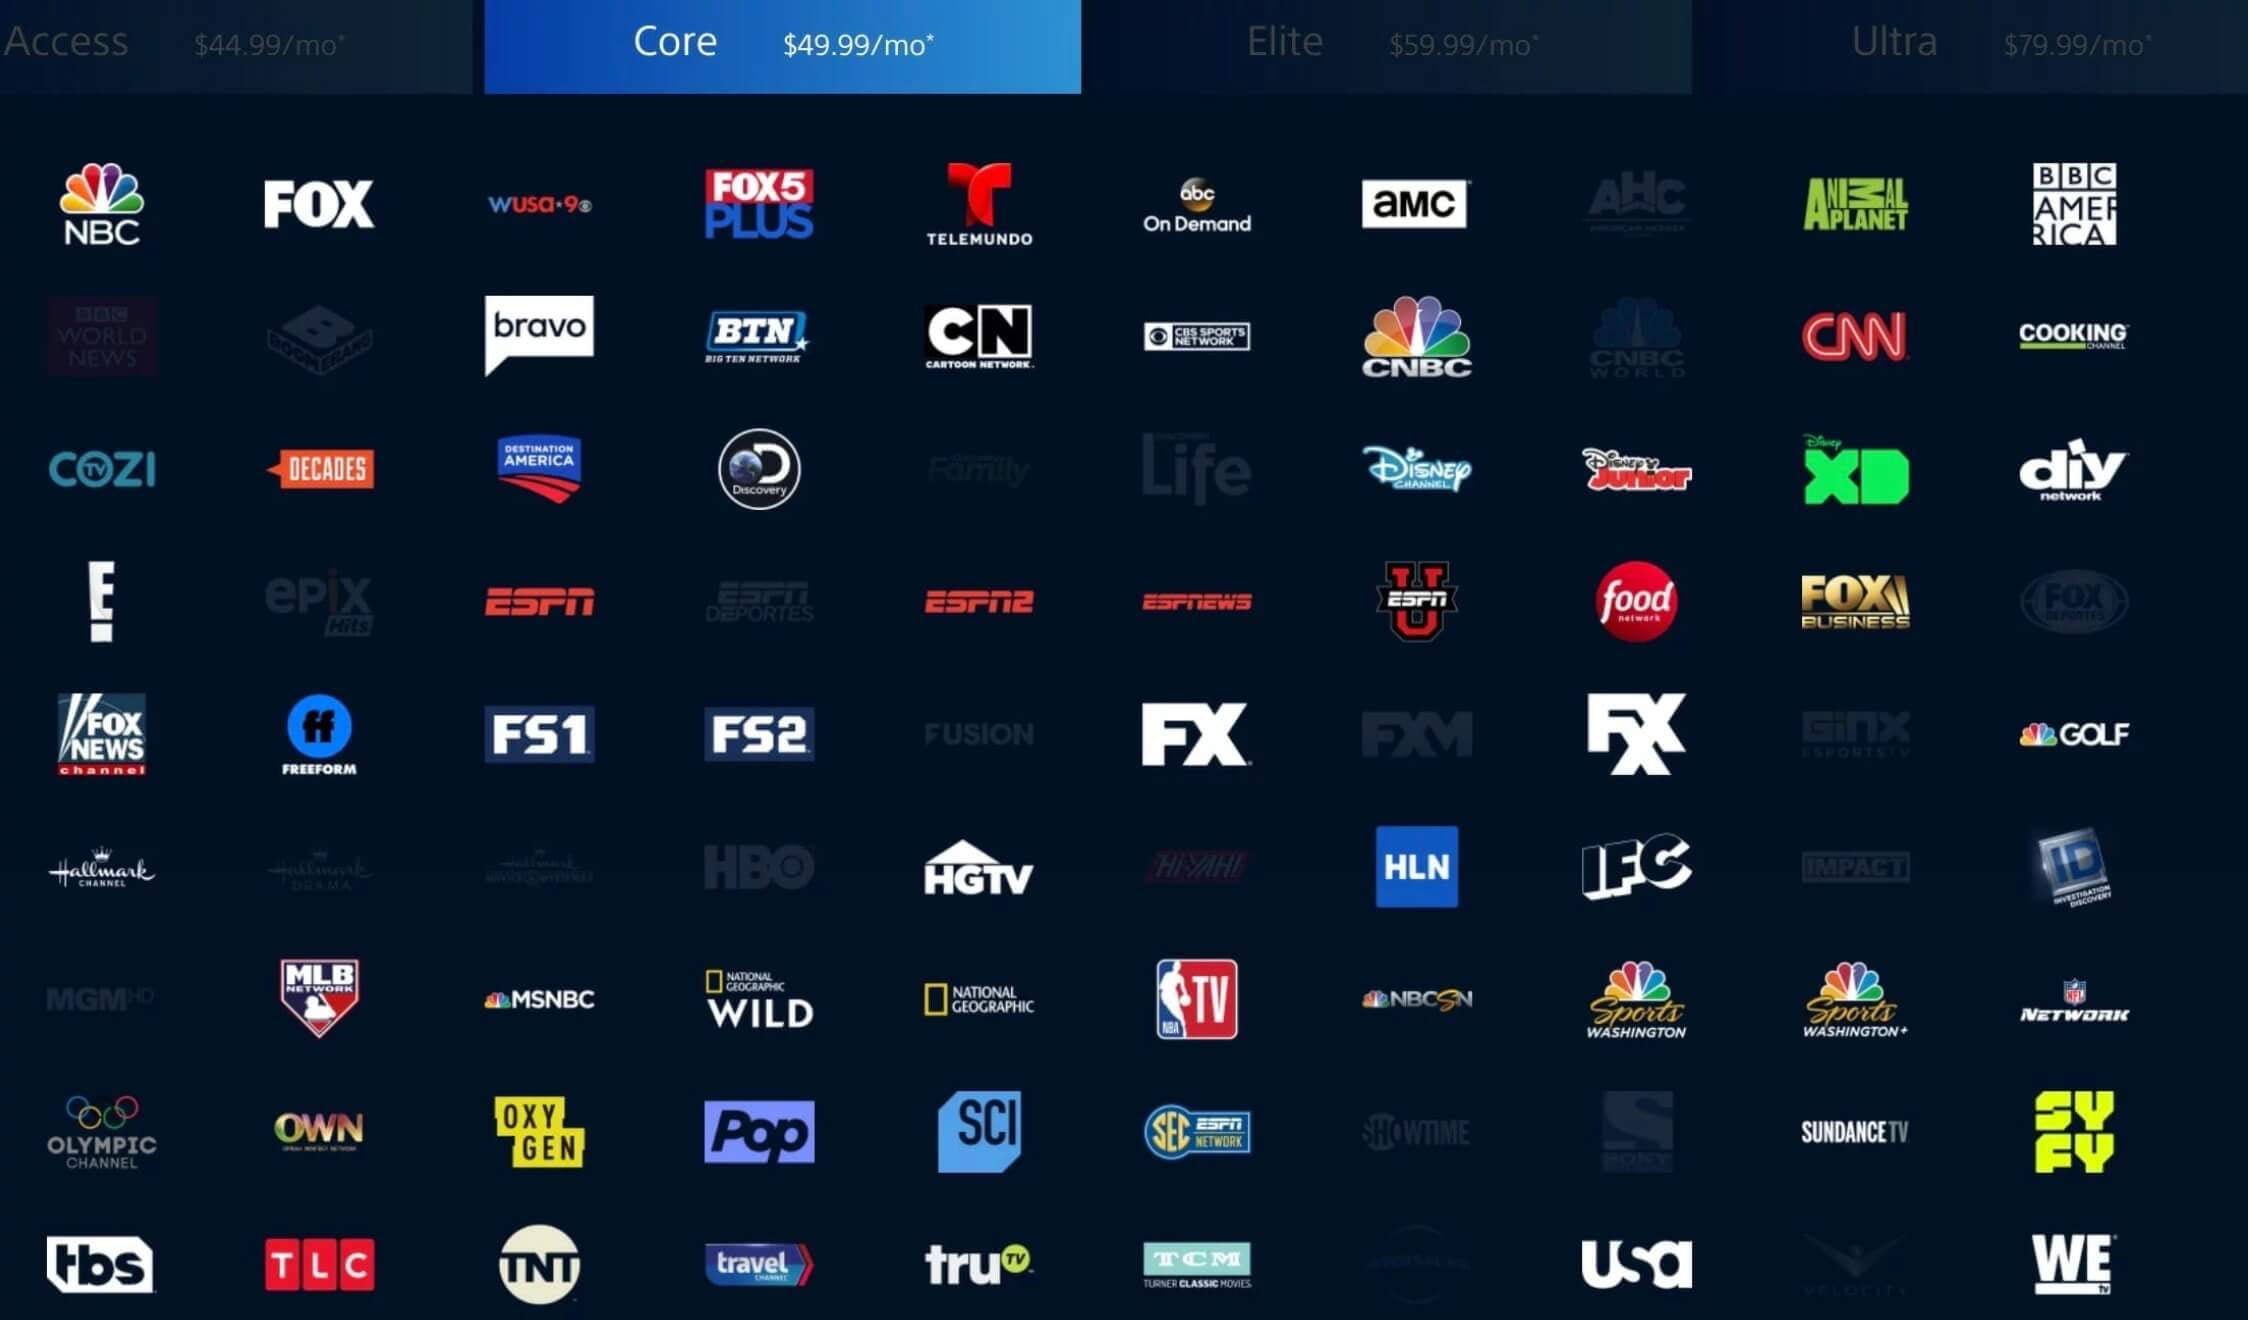 2019 mls playoffs lafc vs la galaxy soccer live stream free playstation vue